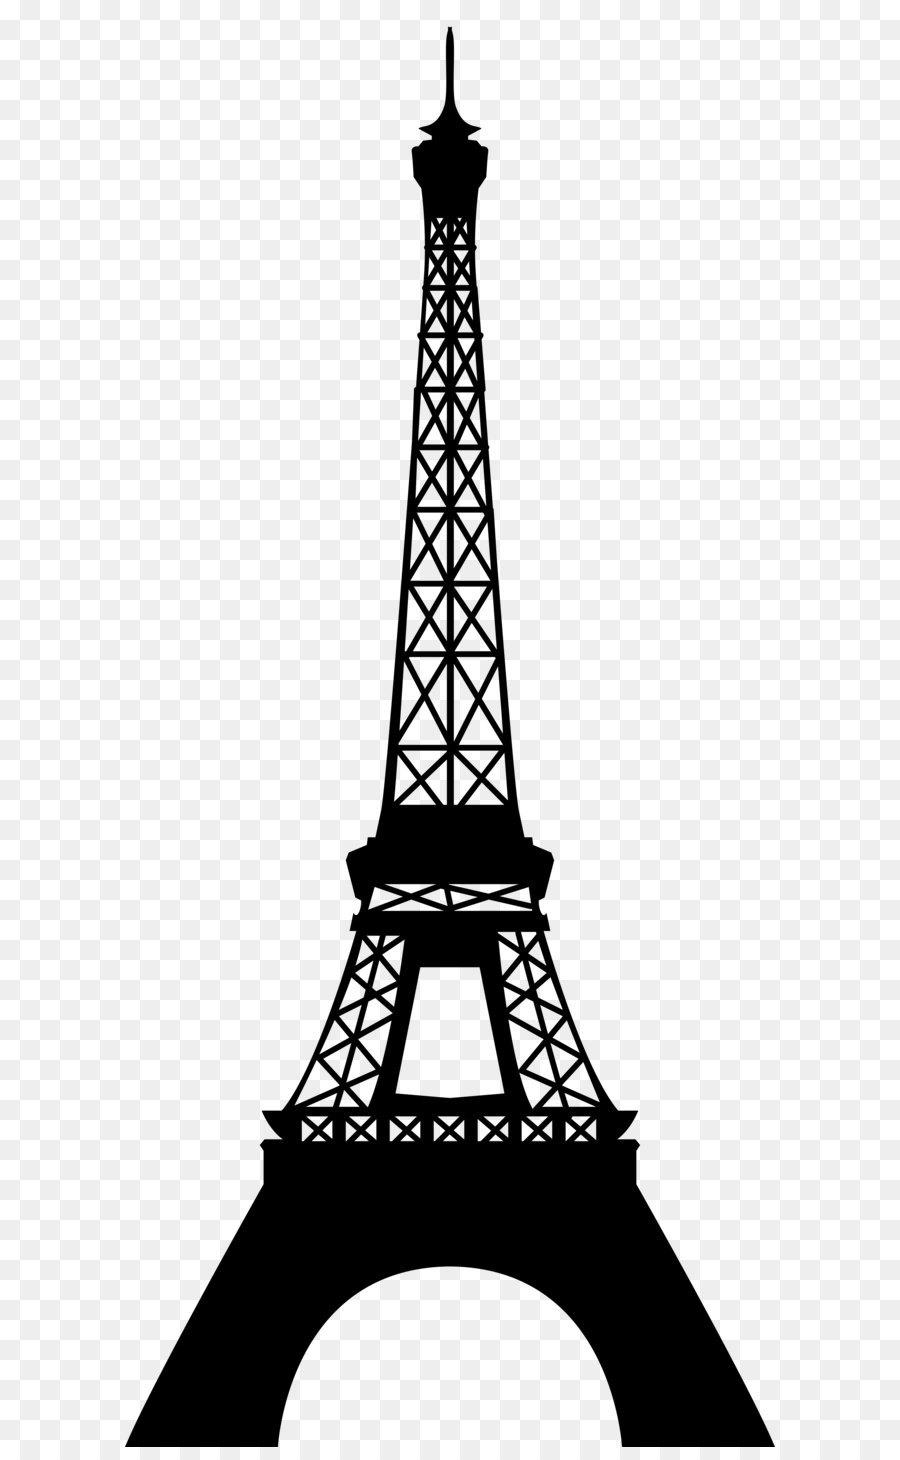 eiffel tower clip art eiffel tower silhouette transparent png clip rh kisspng com eiffel tower clipart png eiffel tower clip art black and white